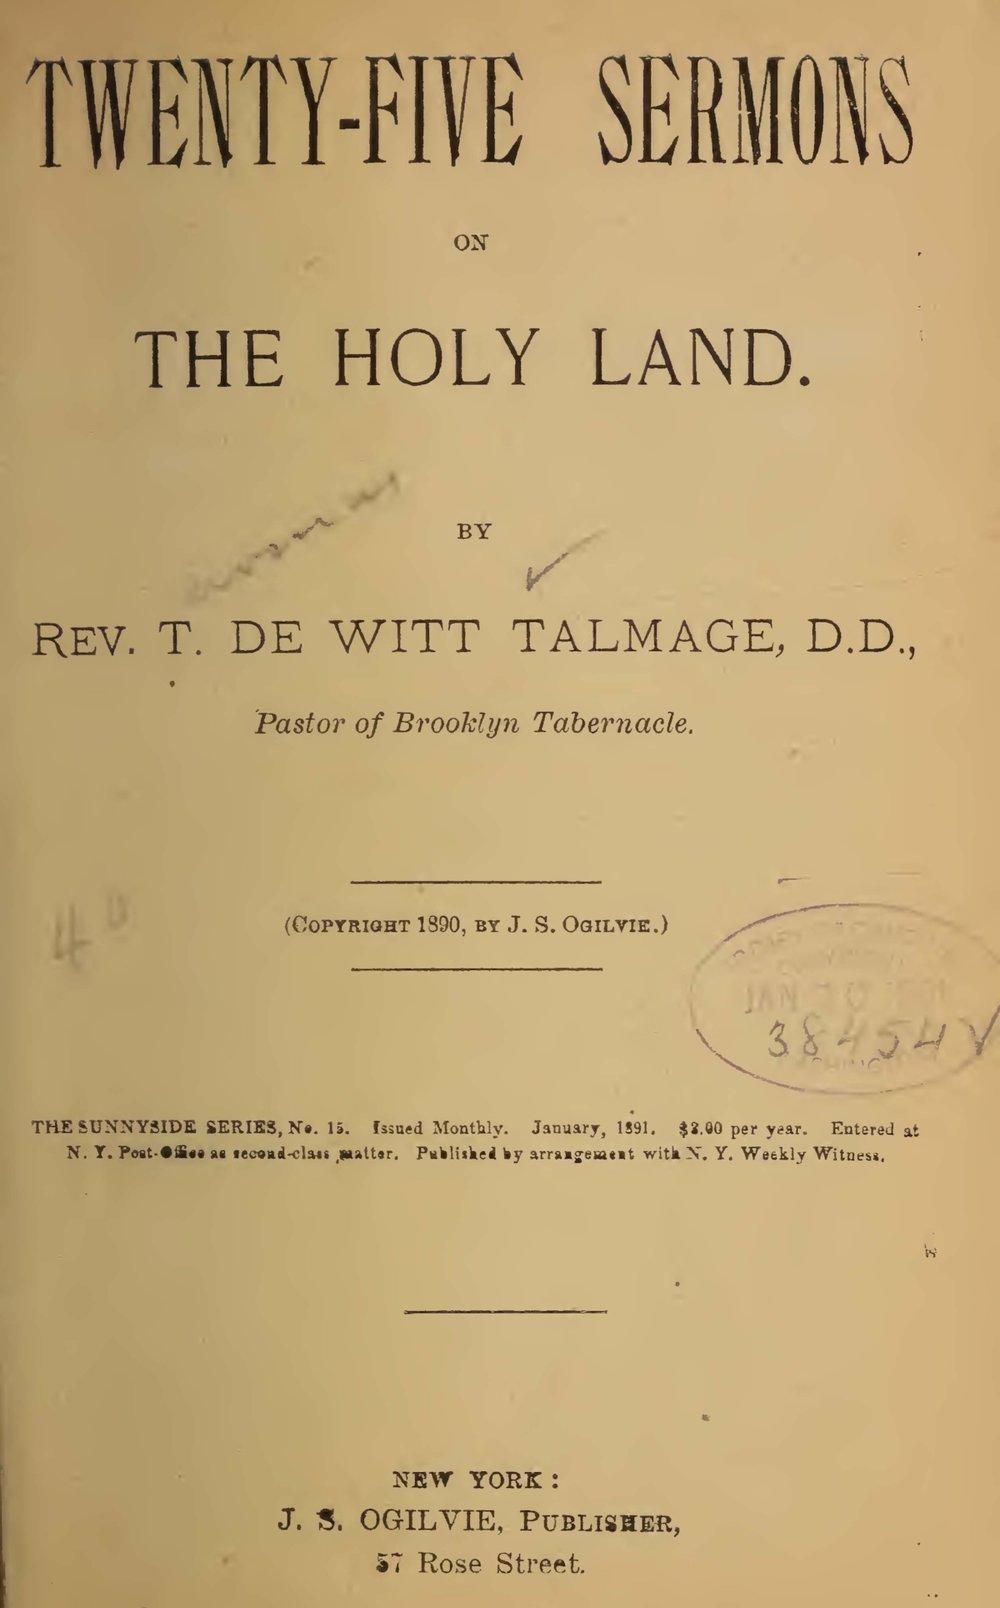 Talmage, Thomas De Witt, Twenty-Five Sermons on the Holy Land Title Page.jpg